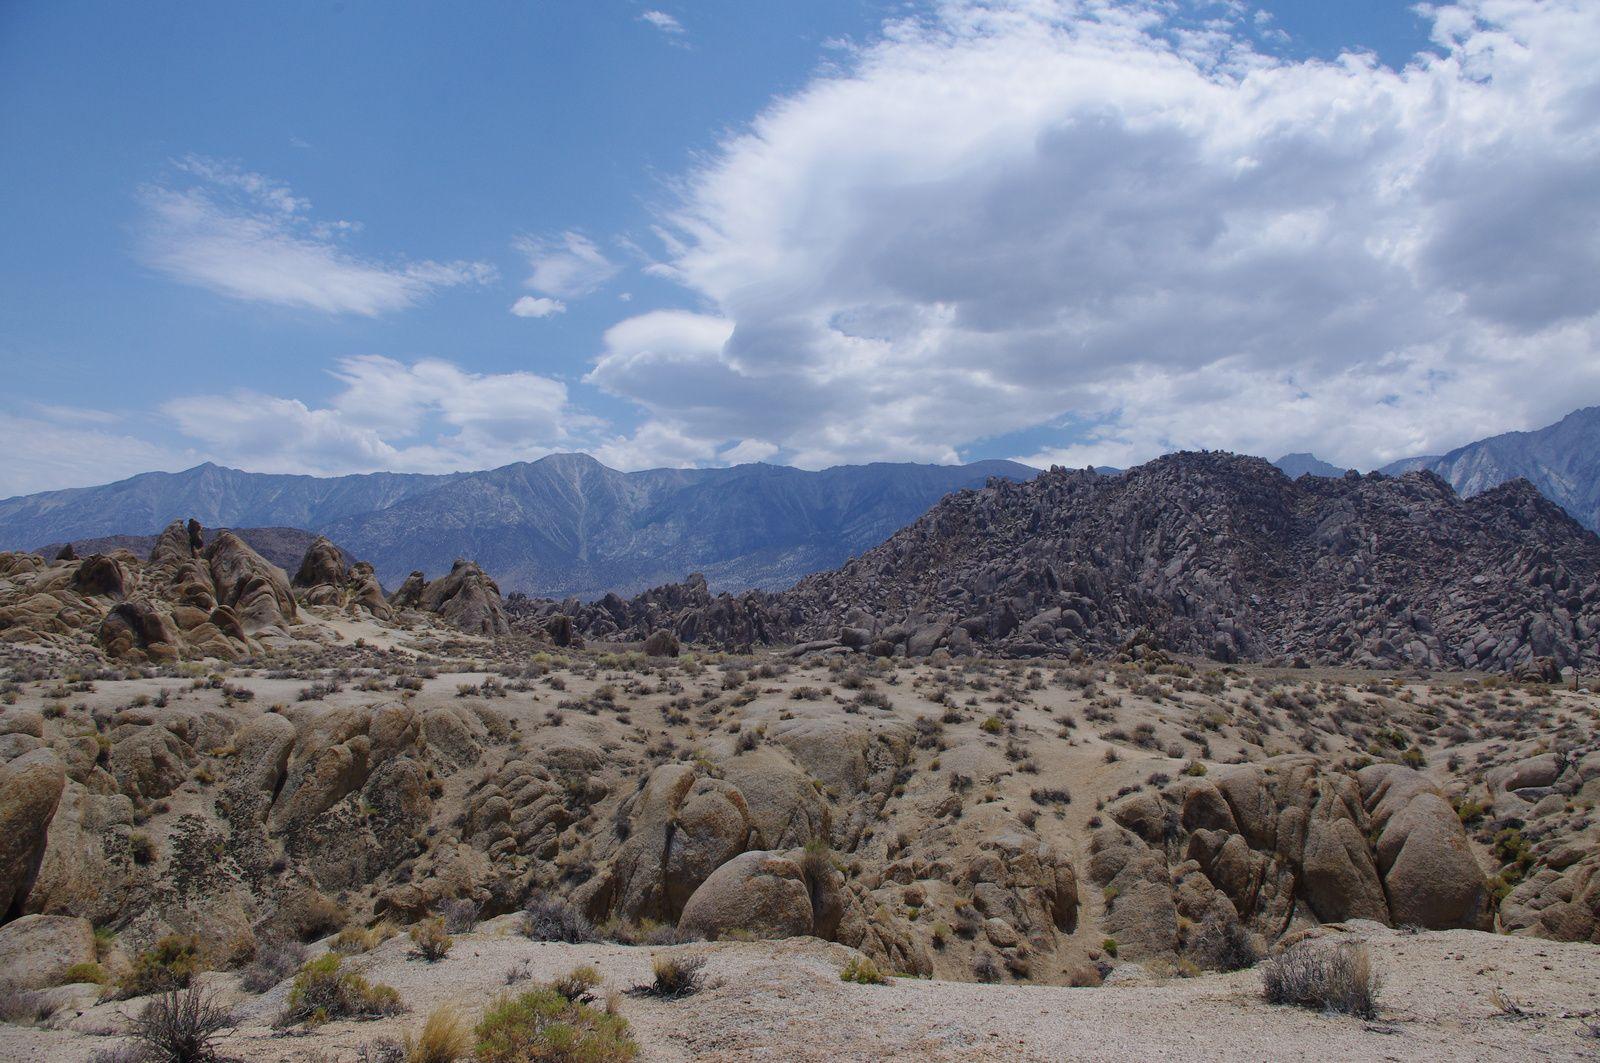 USA Road Trip - Jour 22/25 - Valley of Death - Lone Pine - Bridgeport